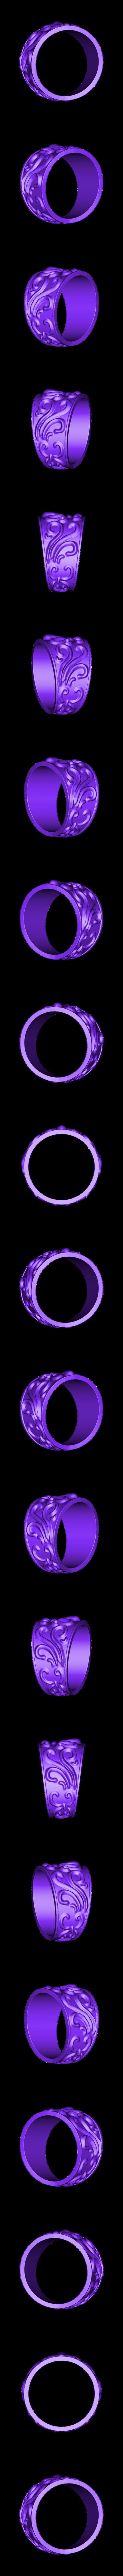 418 Ring.stl Download free STL file Ring - Vikings 3D Prophecy - Season 4, Episode 18 - Revenge • 3D printer design, 3DBROOKLYN